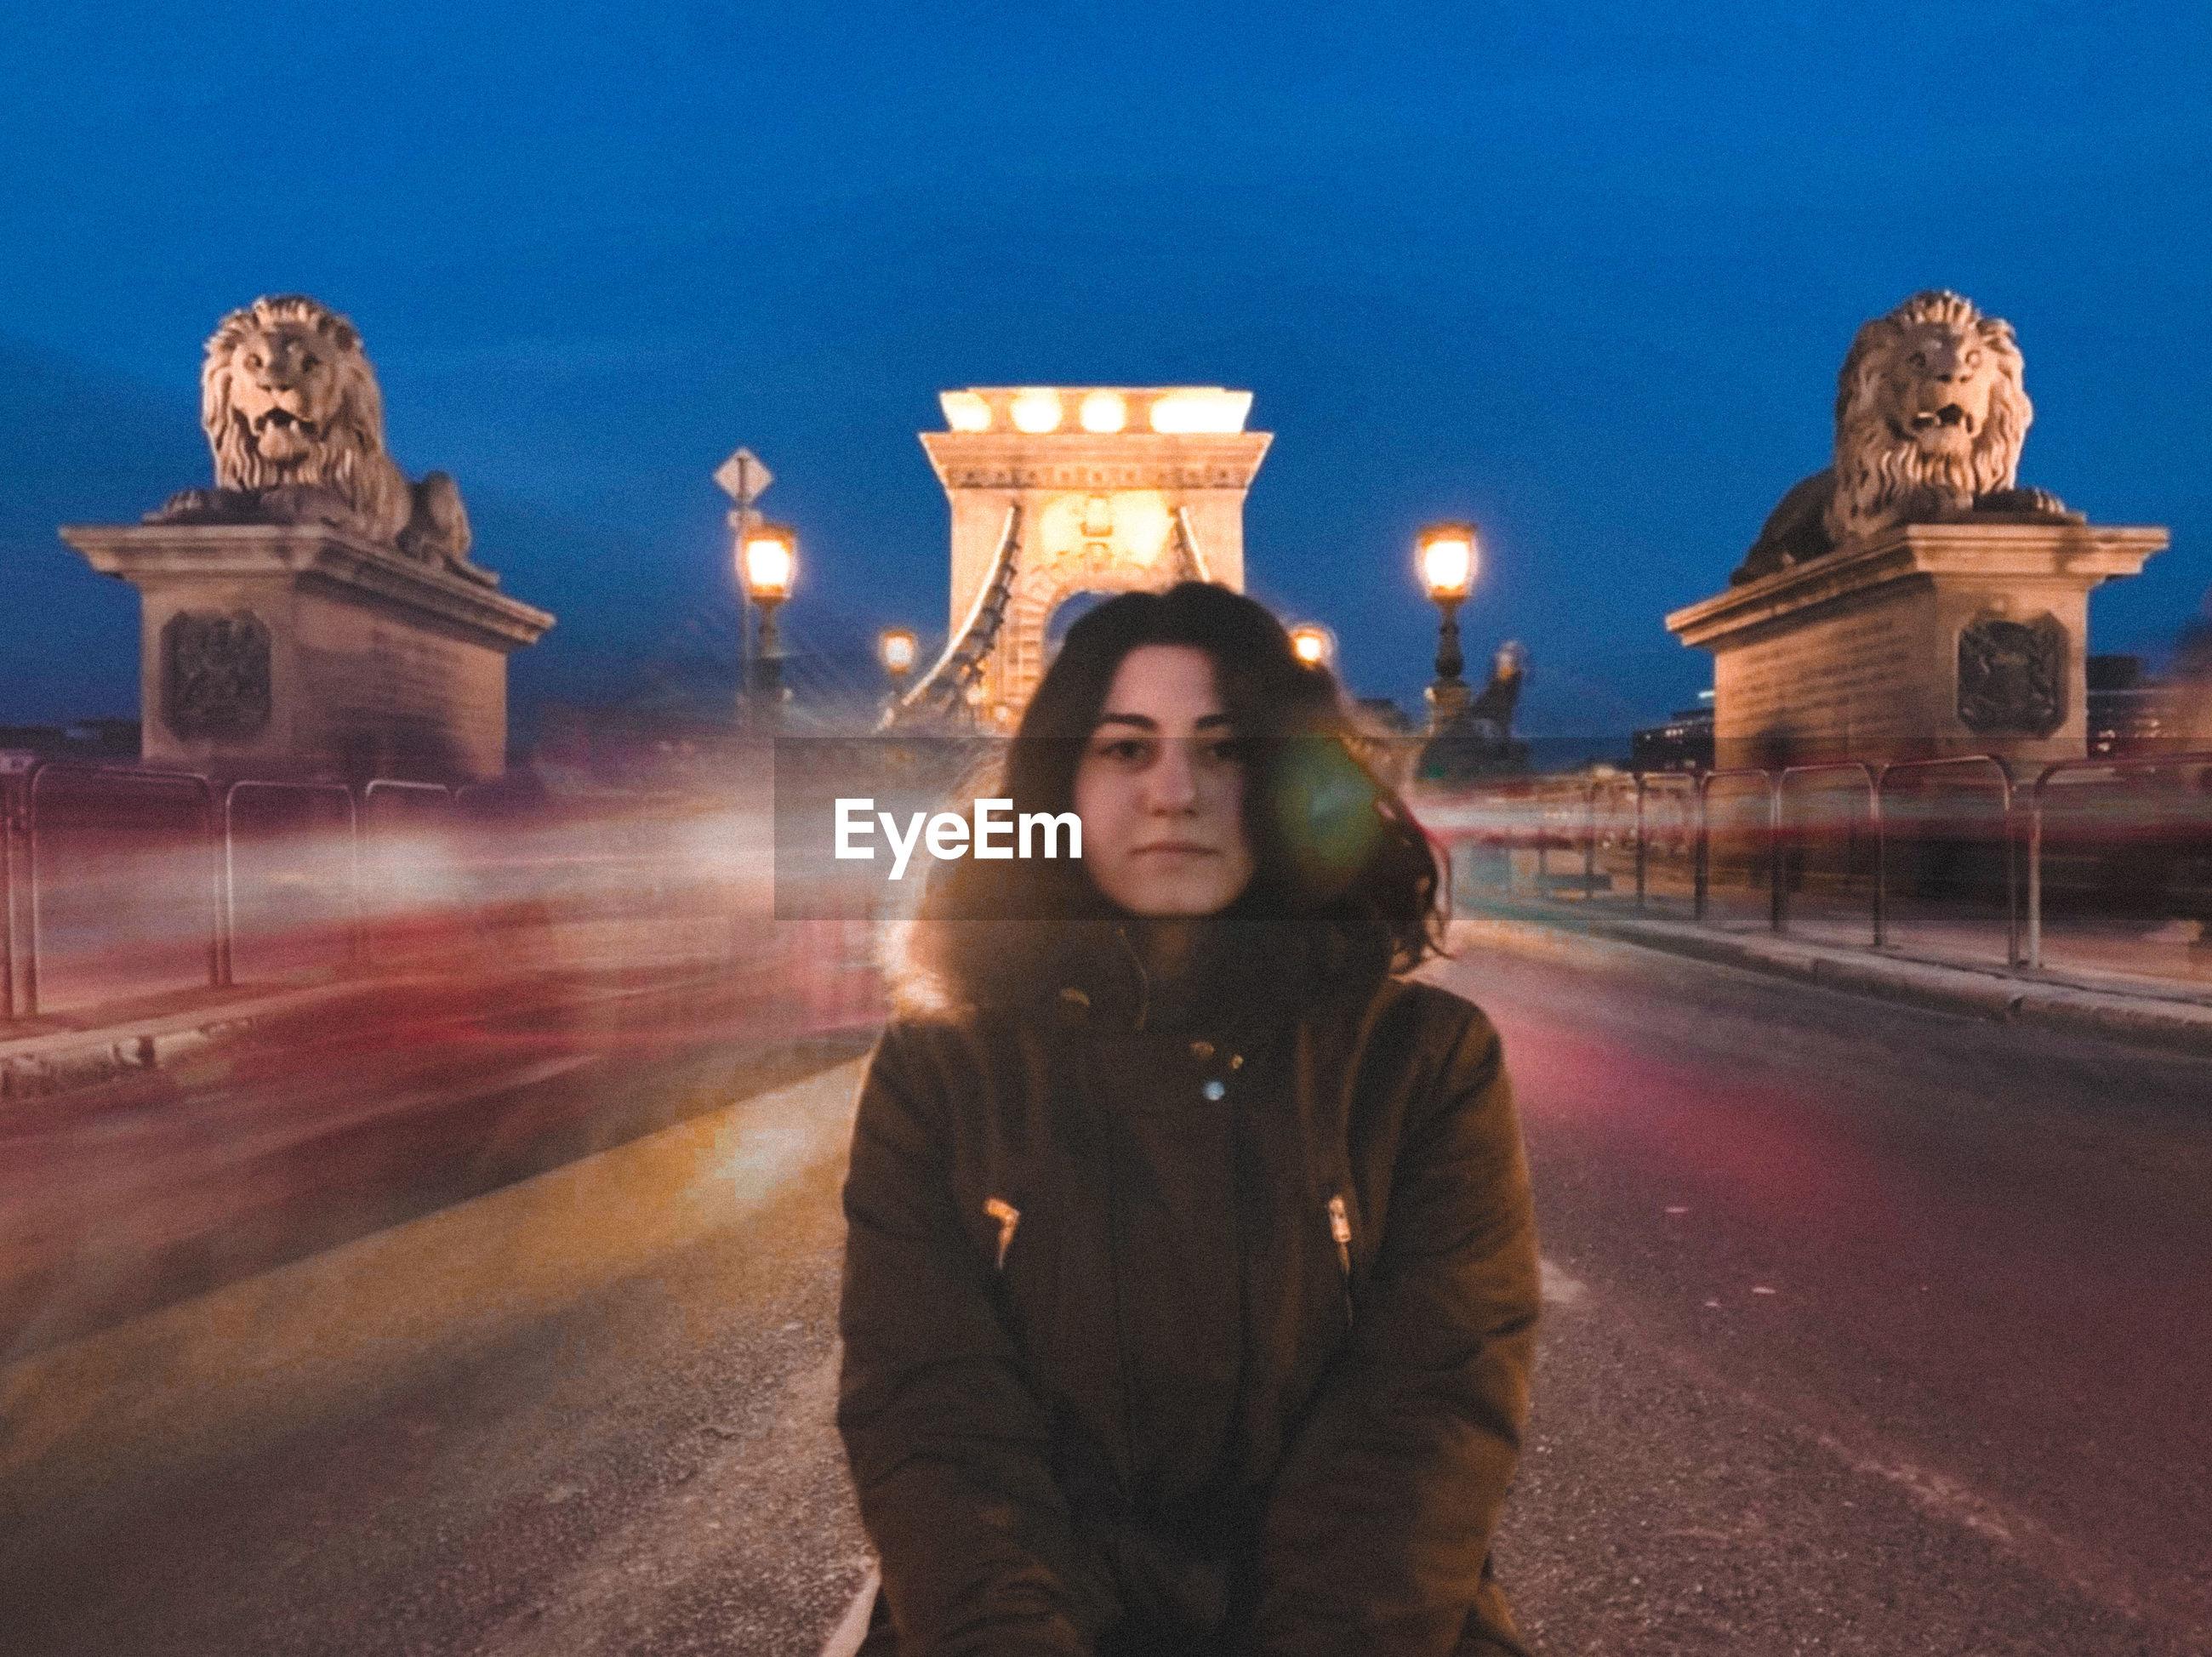 Woman standing on illuminated city at night